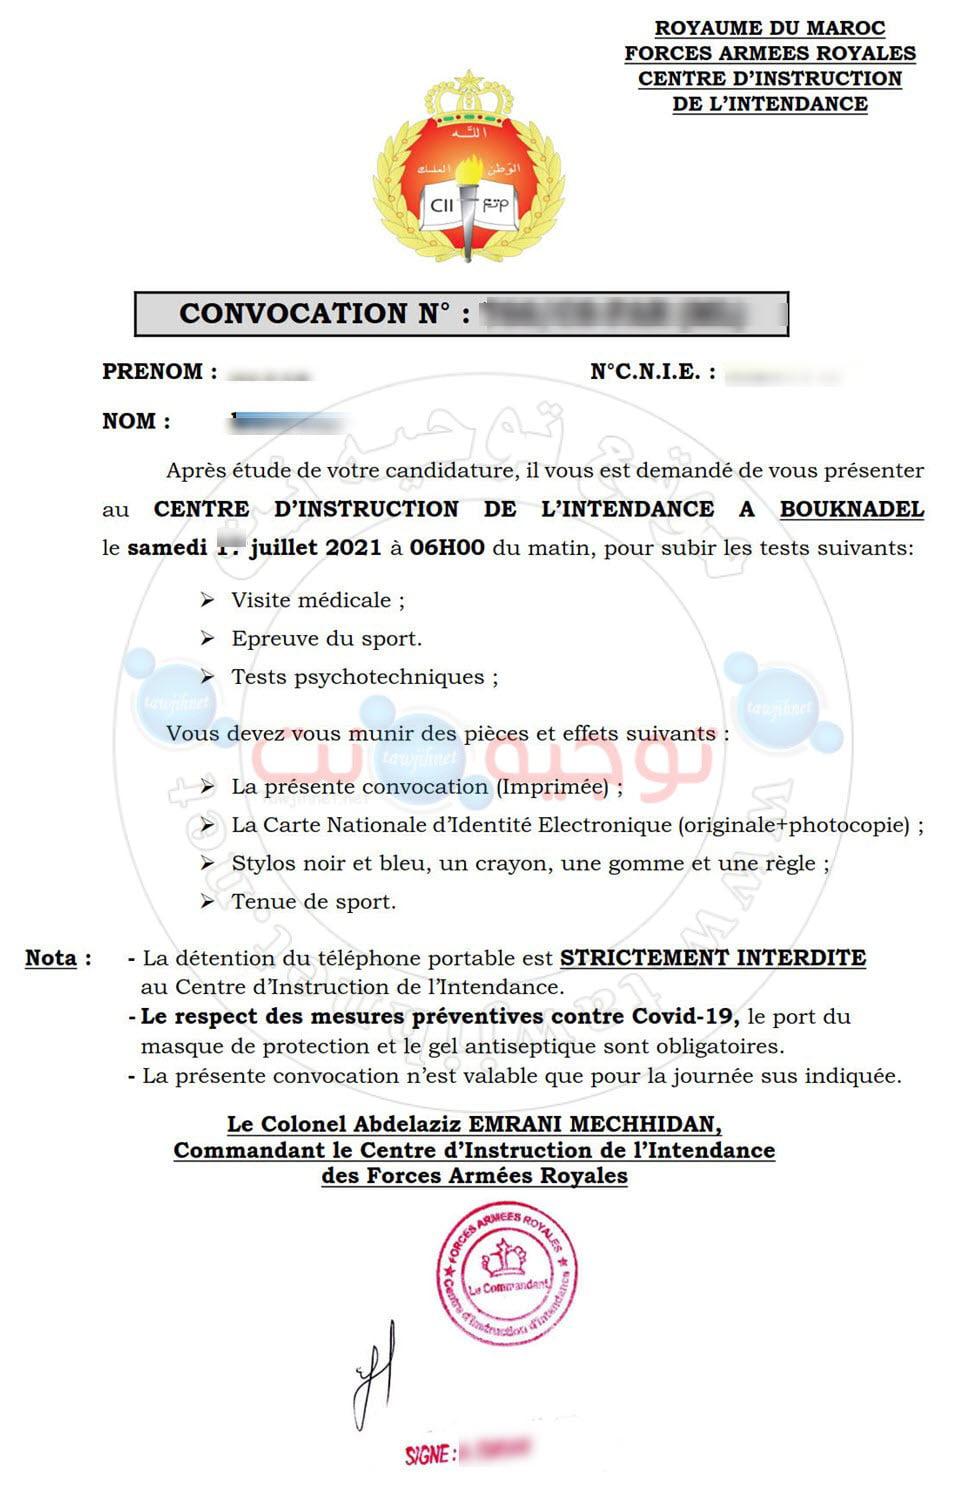 convocation-sous-officiers-bouknadel-2021.jpg